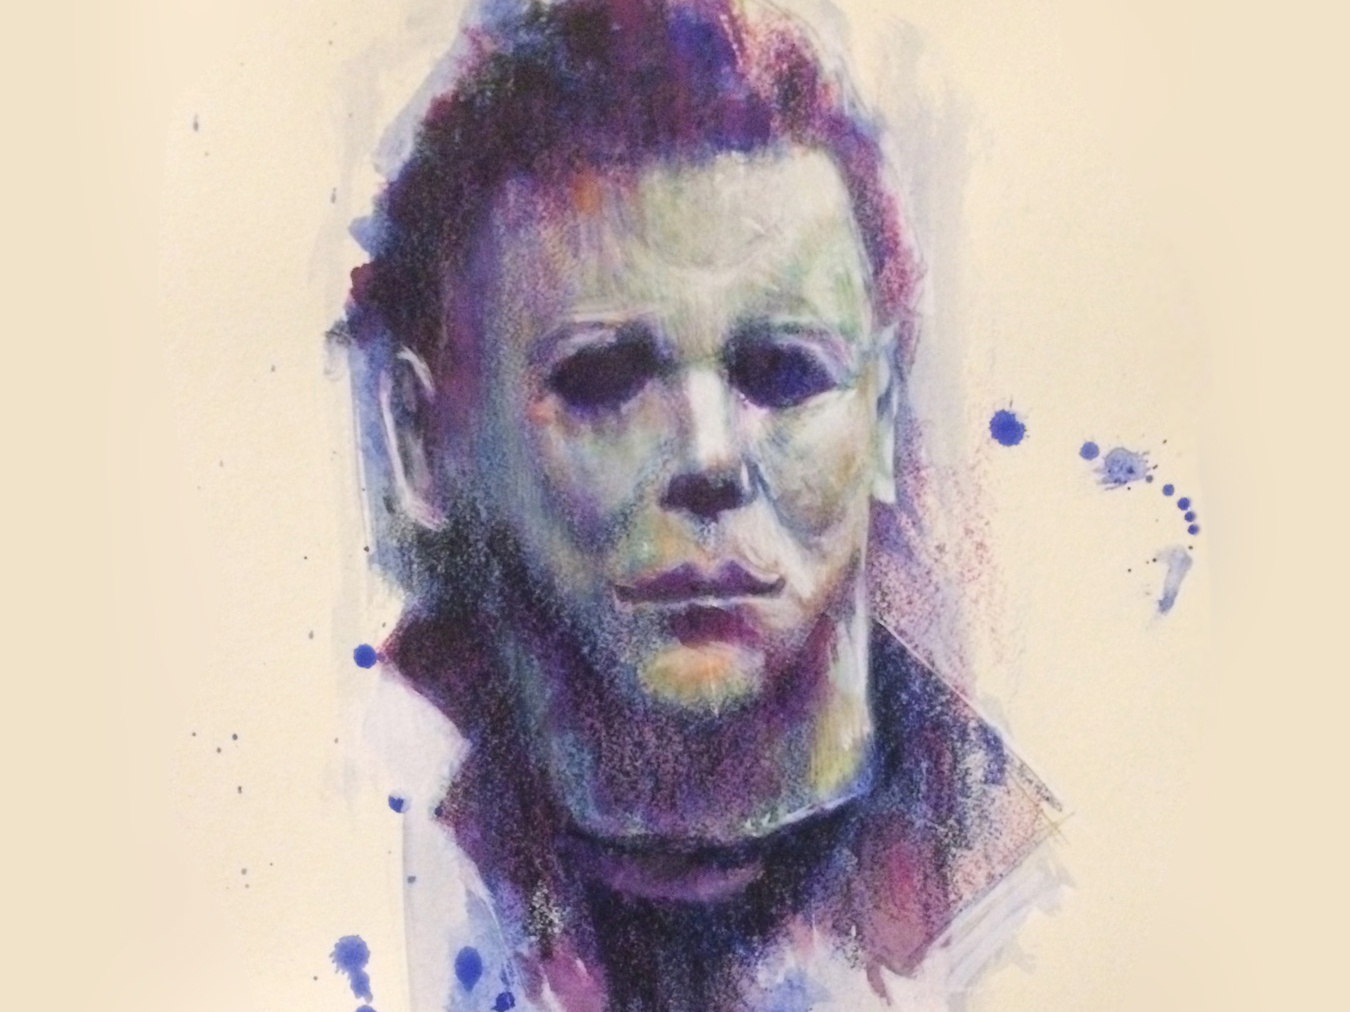 Michael Myers film portrait colored pencil acrylic painting horror 1978 john carpenter michael myers halloween halloween movie illustration jack c. gregory